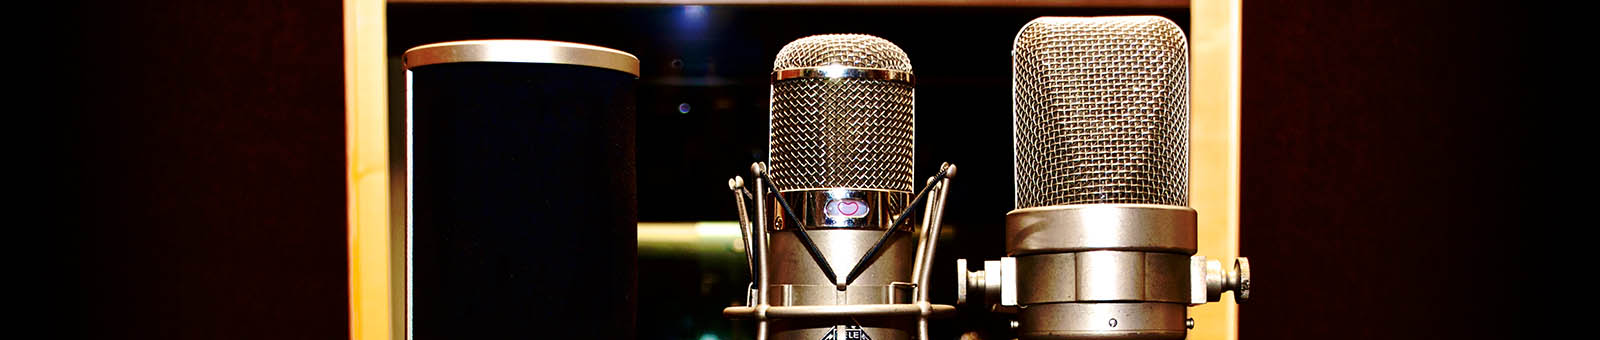 Neumann Mikrofone im Studio